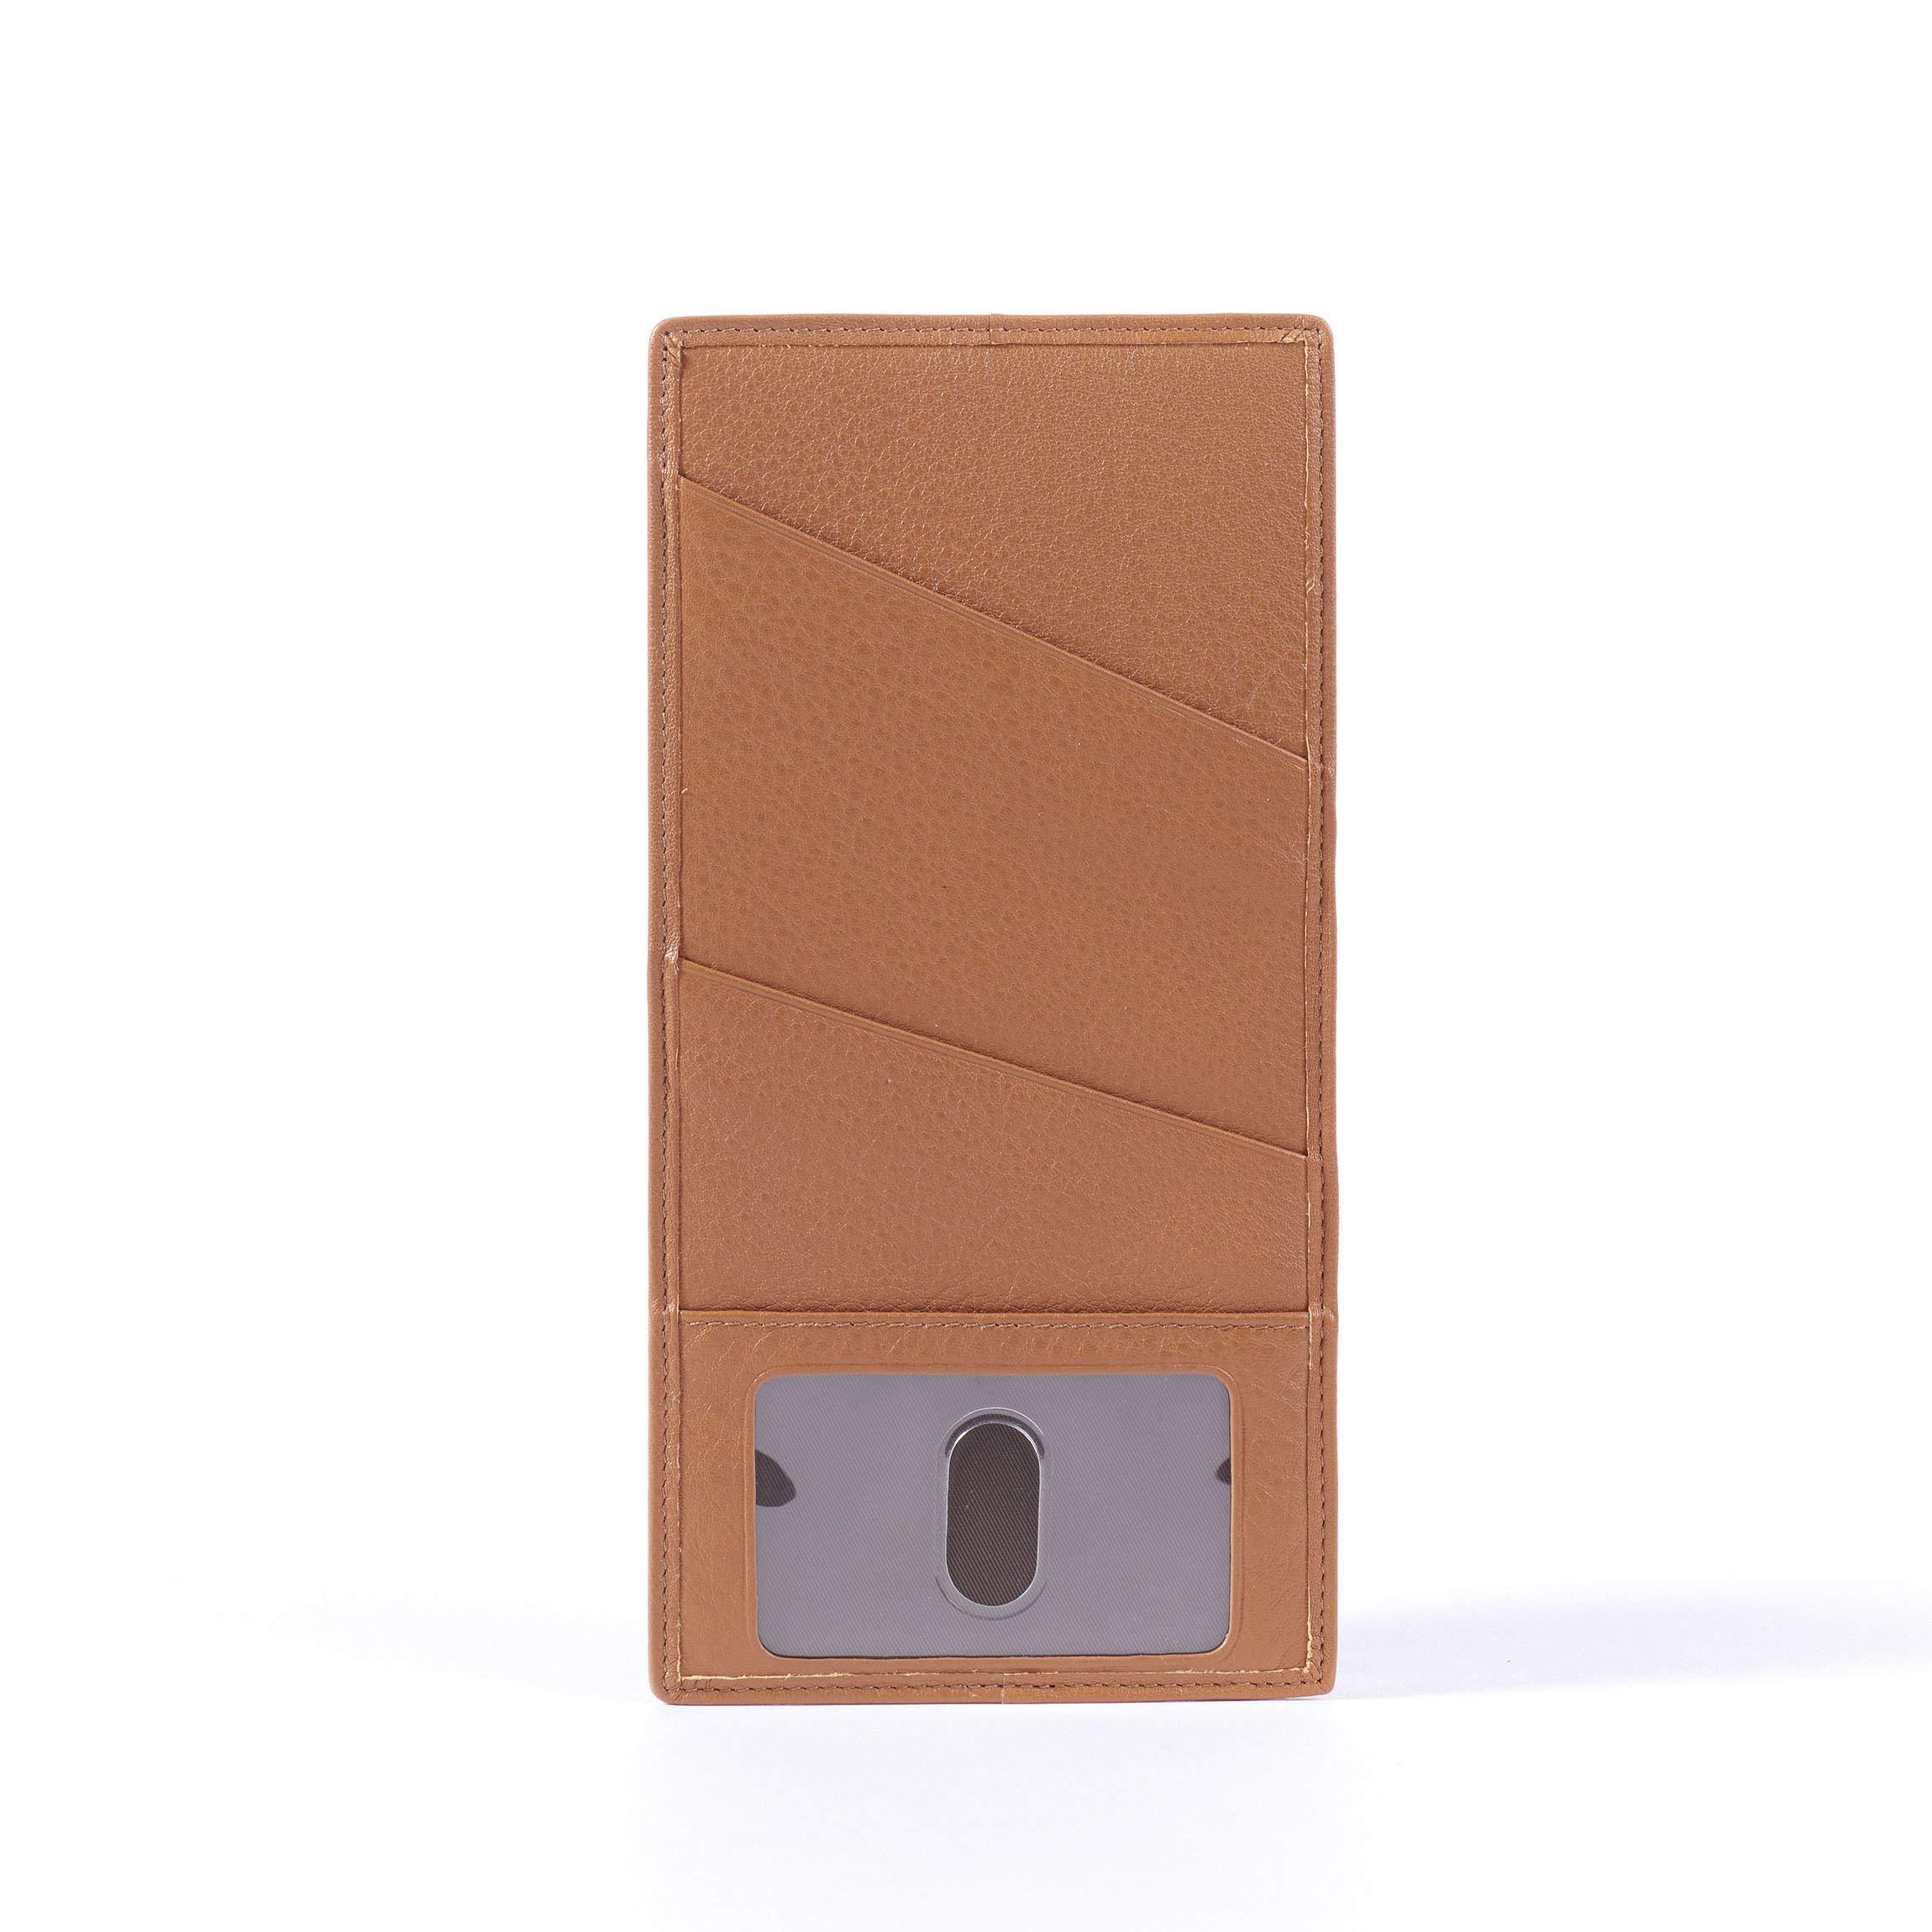 Slim Passport Ticket Holder - Full Grain Leather - Cognac (brown)